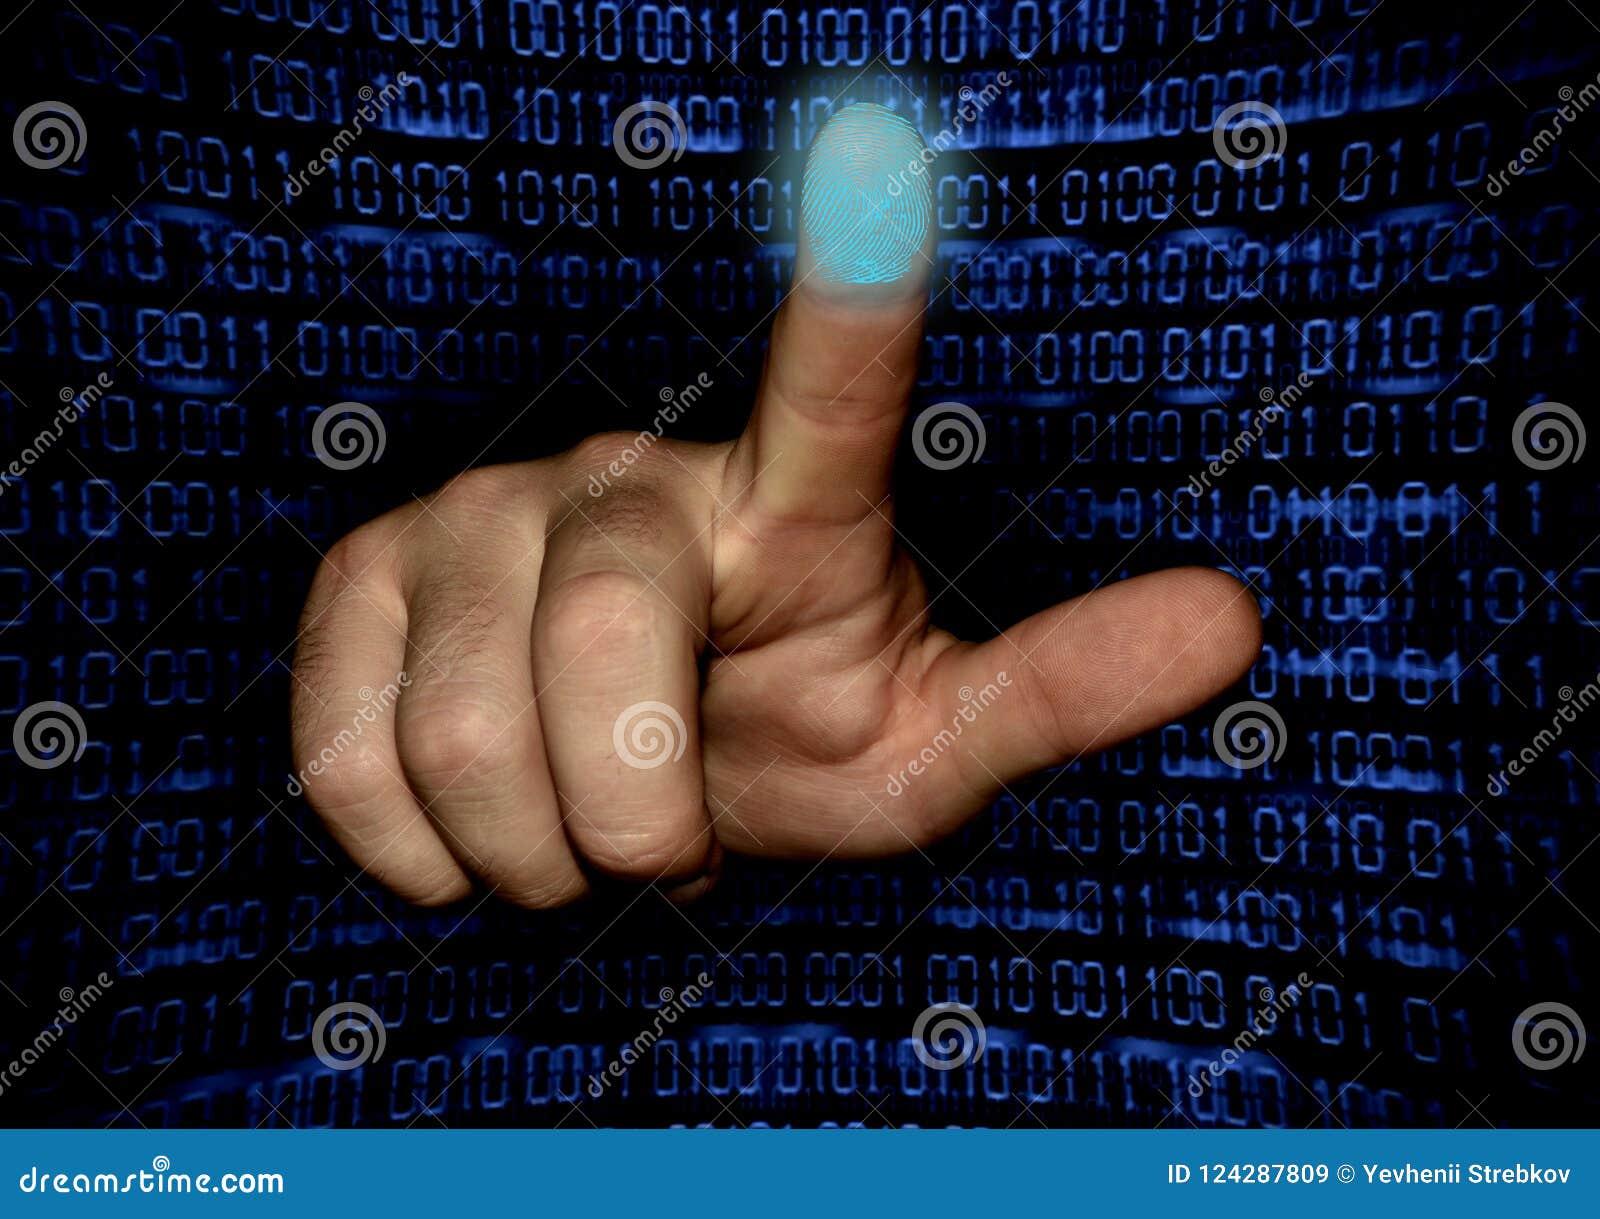 Ręka skanuje odcisk palca palec wskazujący